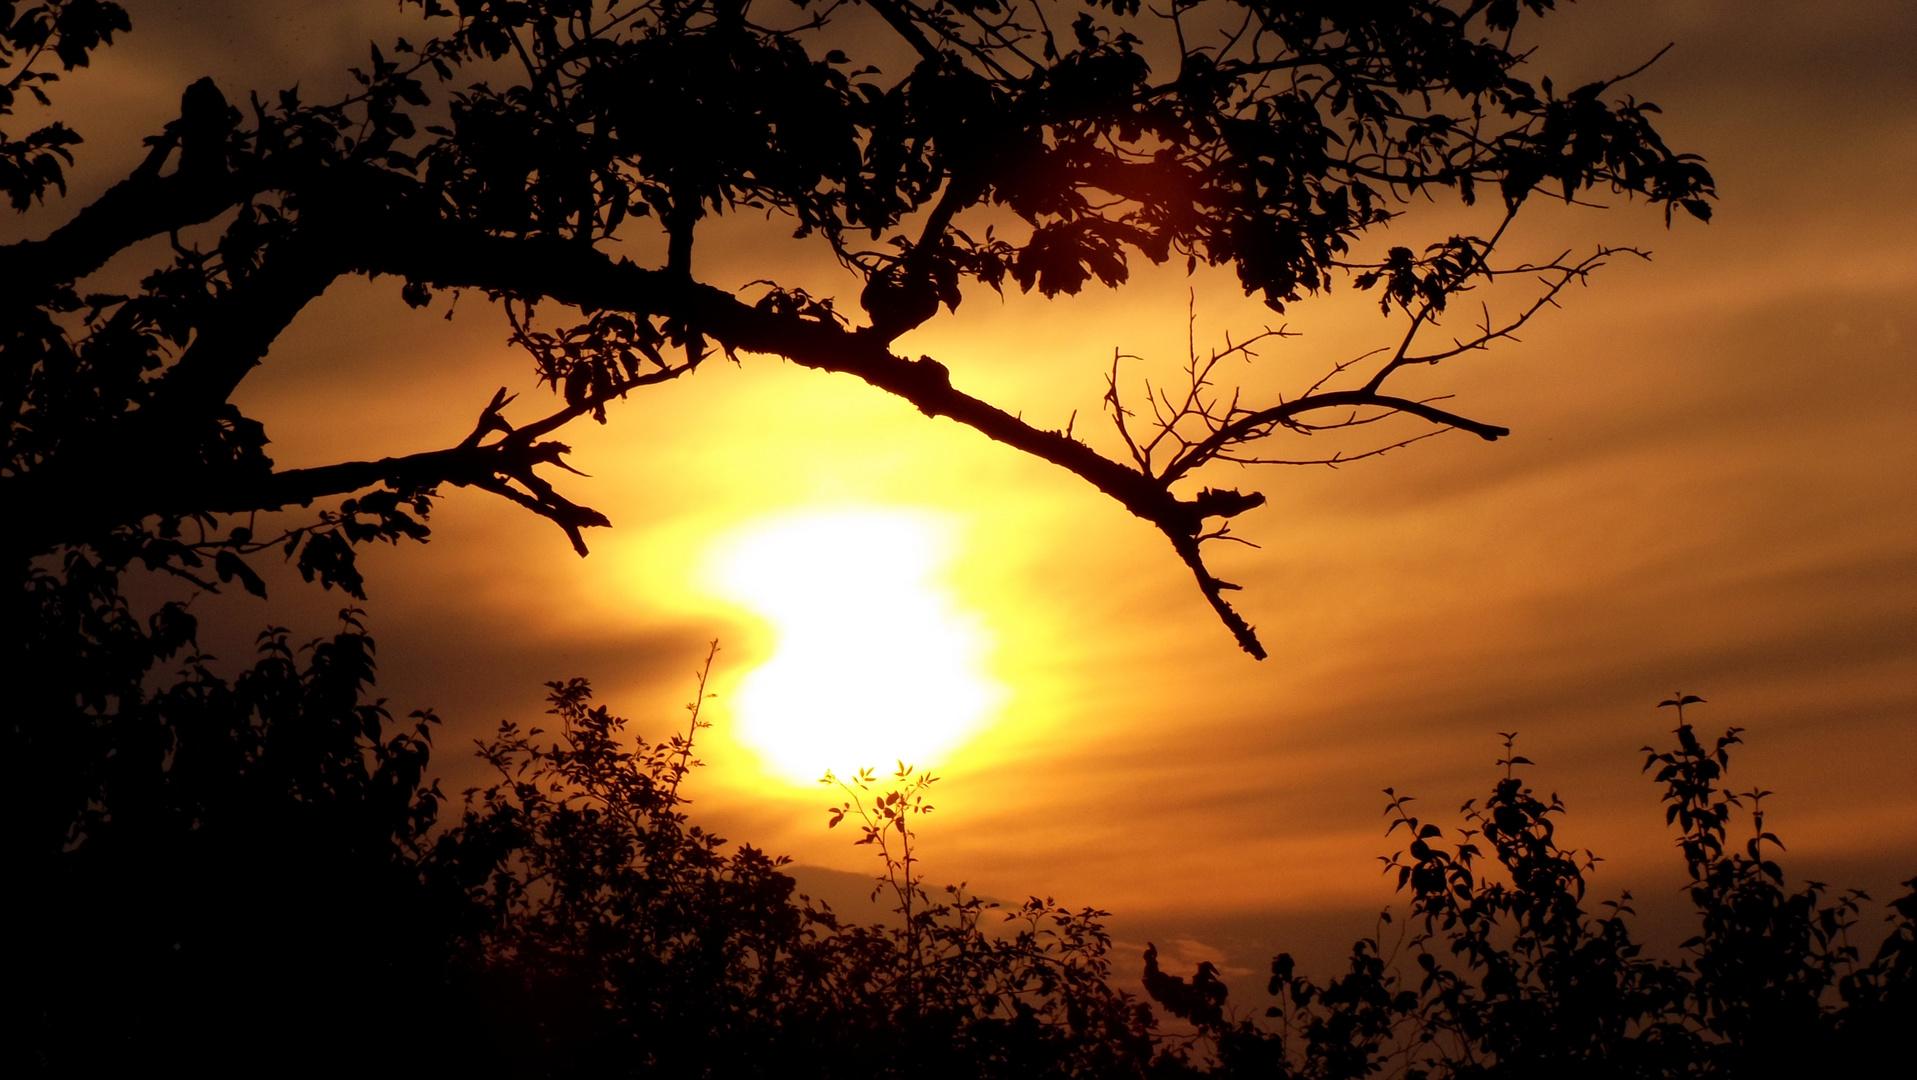 Sunset vom 23.8.2015 19:53